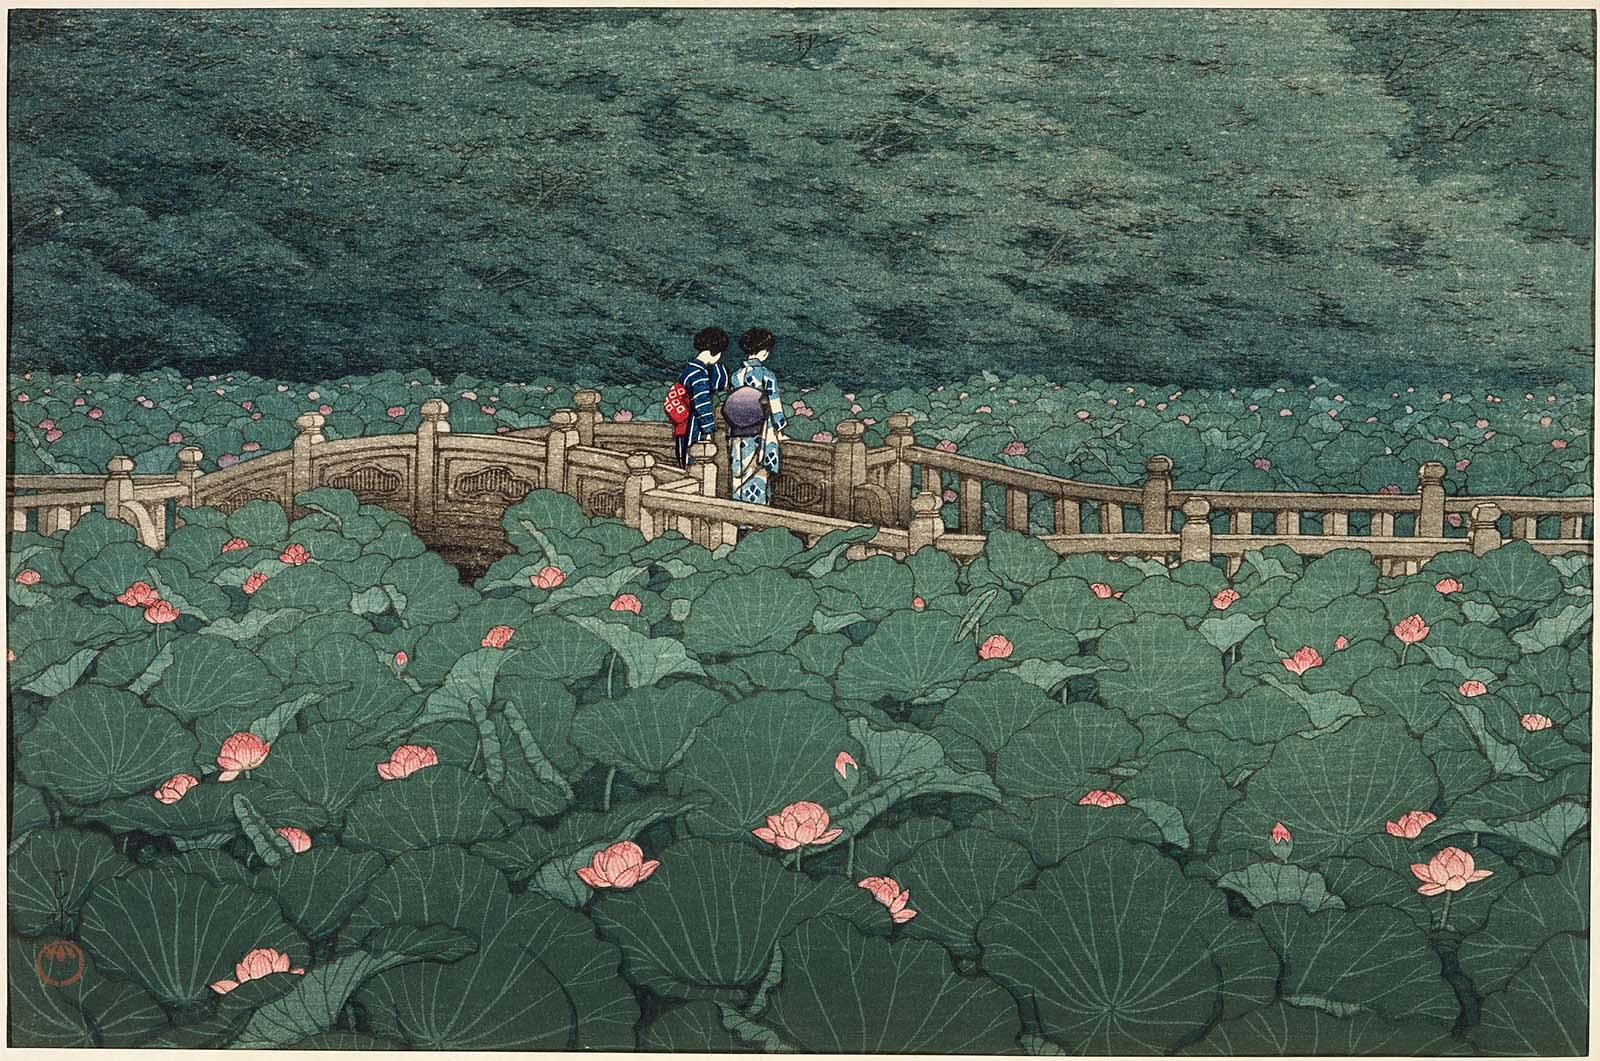 The_Pond_at_Benten_Shrine_in_Shiba,_Kawase_Hasui,_MFAB_50.2885